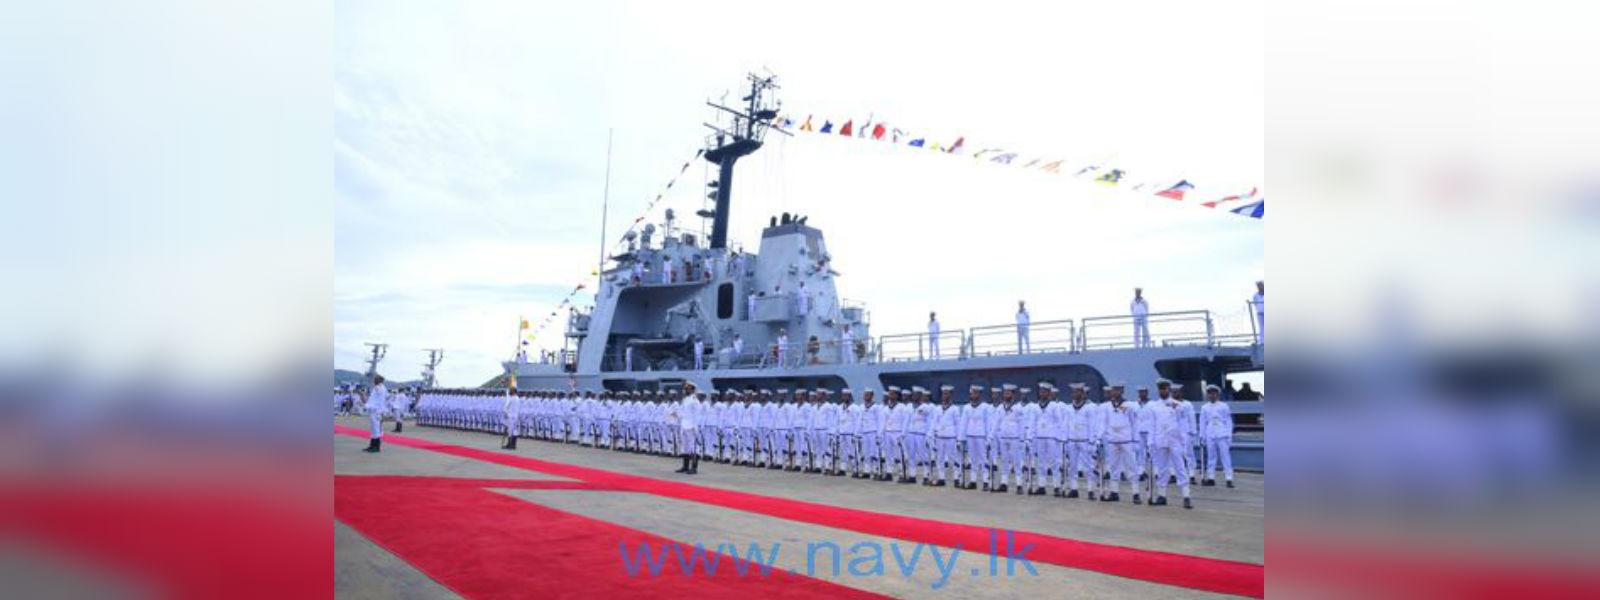 4th Fast Attack Squadron commissioned as 4th Fast Attack Flotilla in Trincomalee